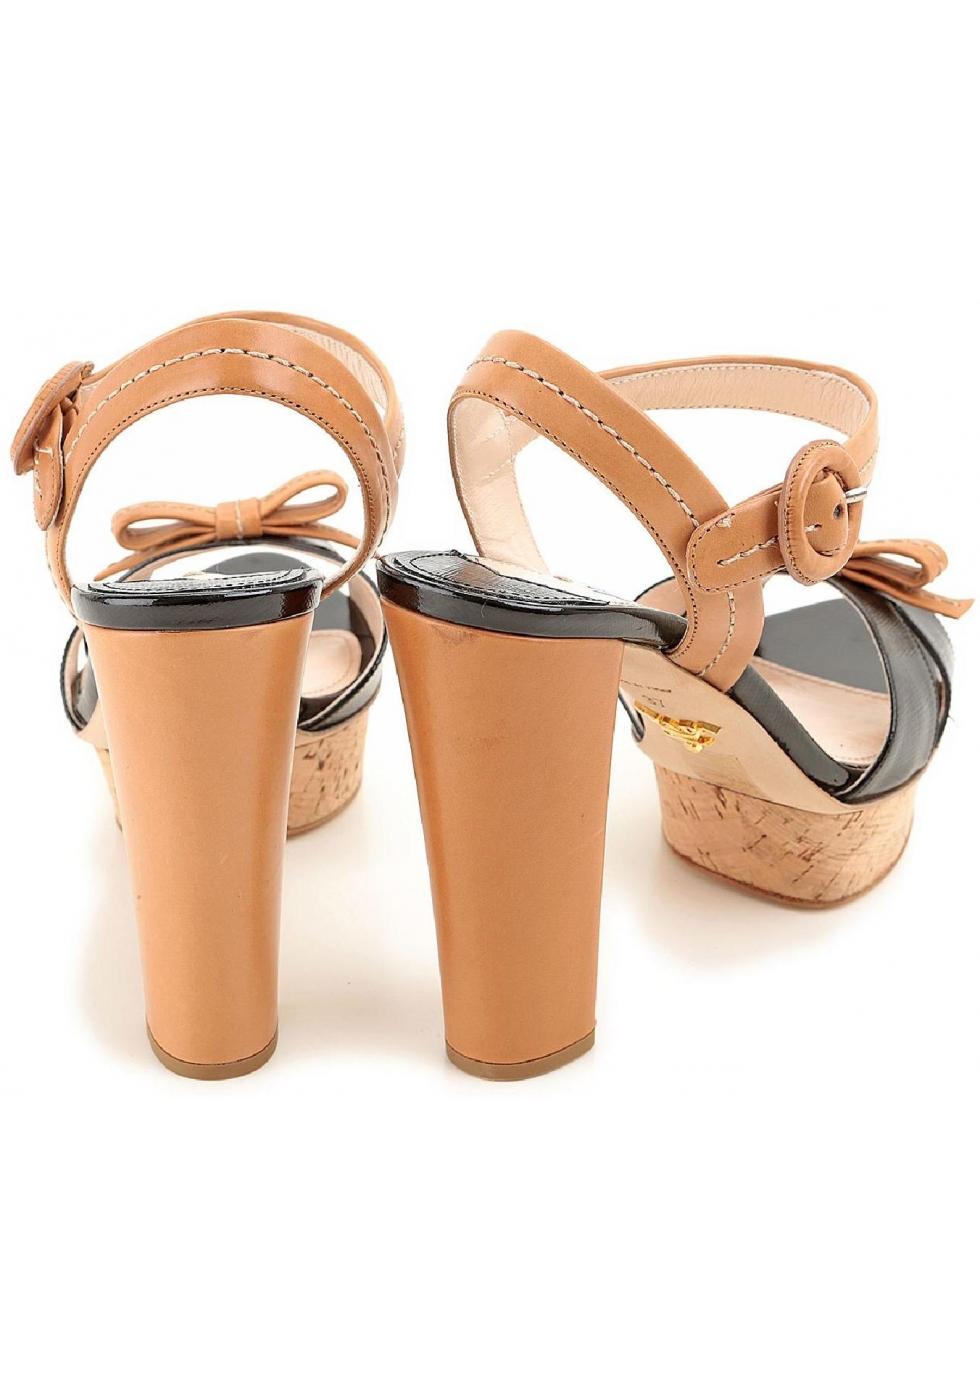 1dd1ebfdc07e Prada sandals with platform in black tan leather - Italian Boutique